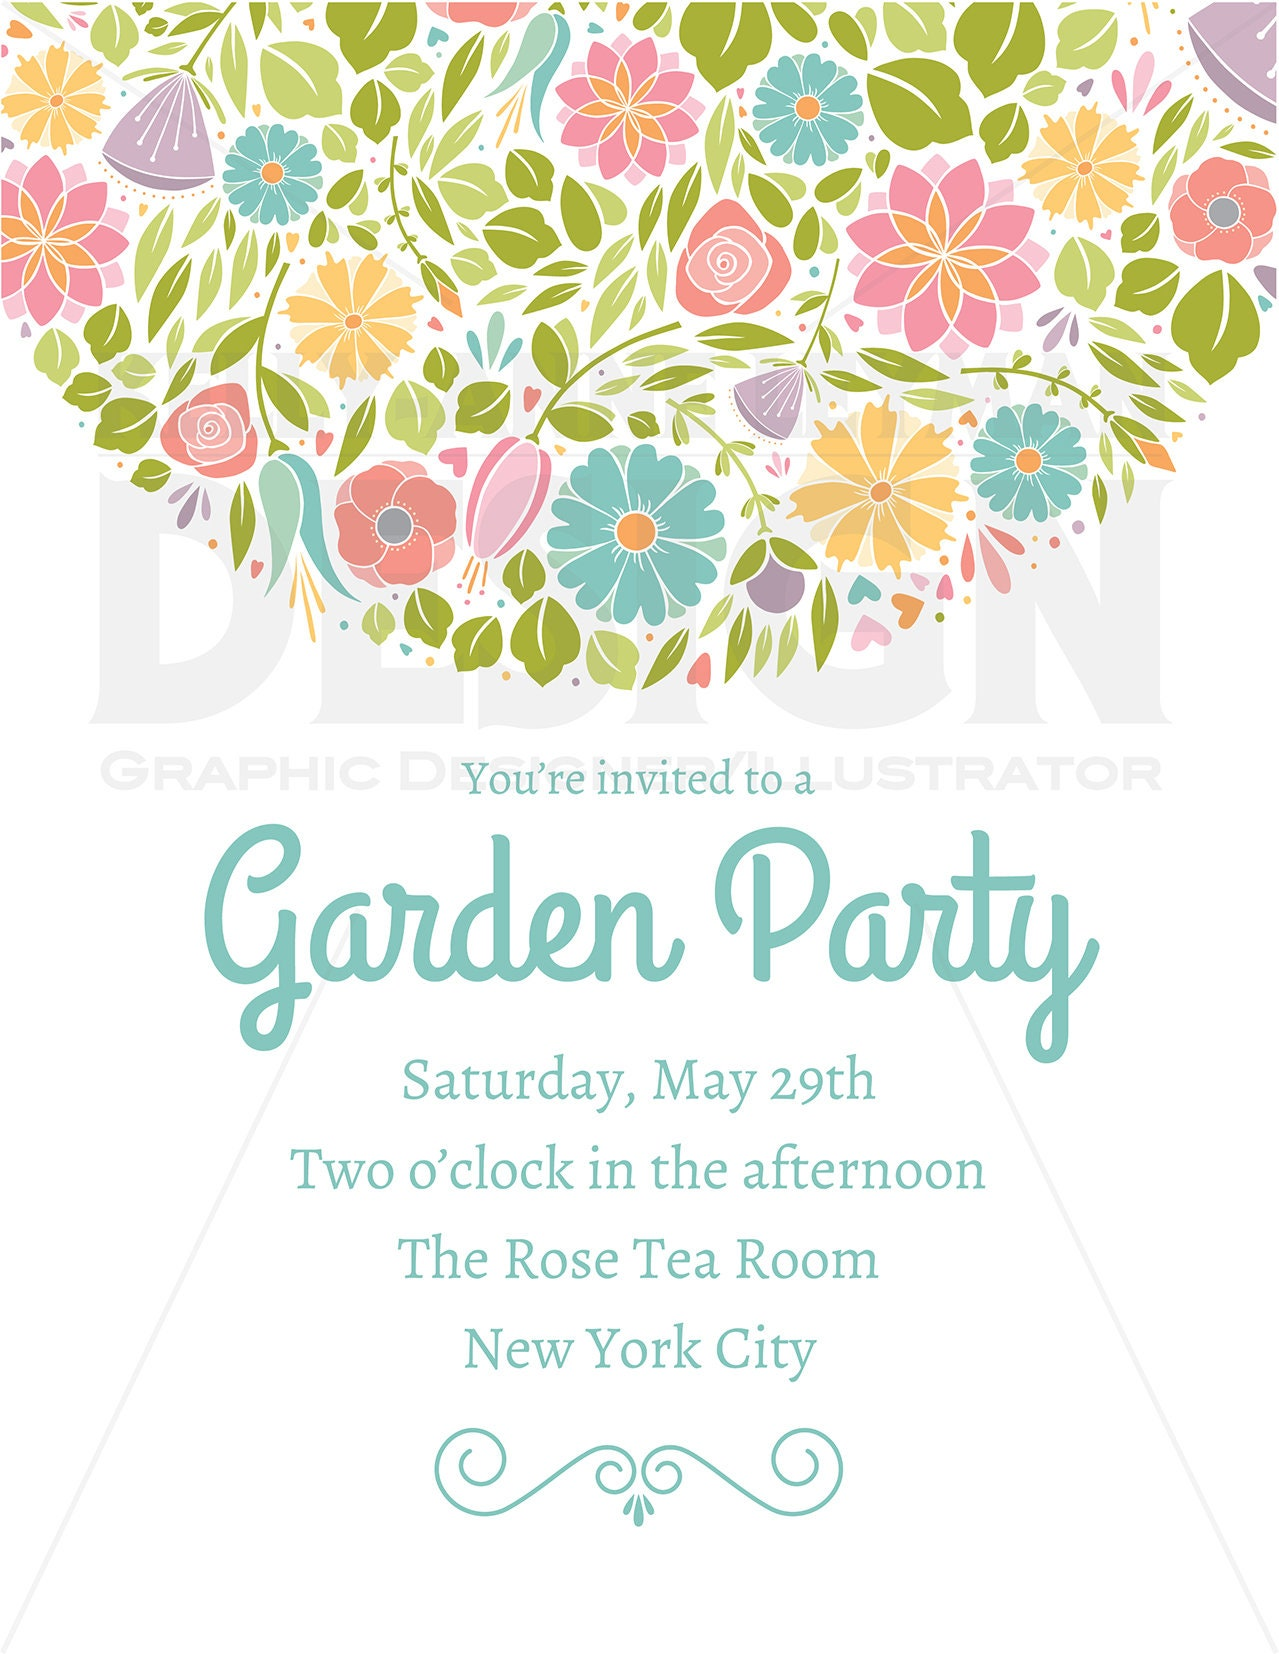 Spring Flower Wedding Party Invitation Clipart, Digital Borders ...